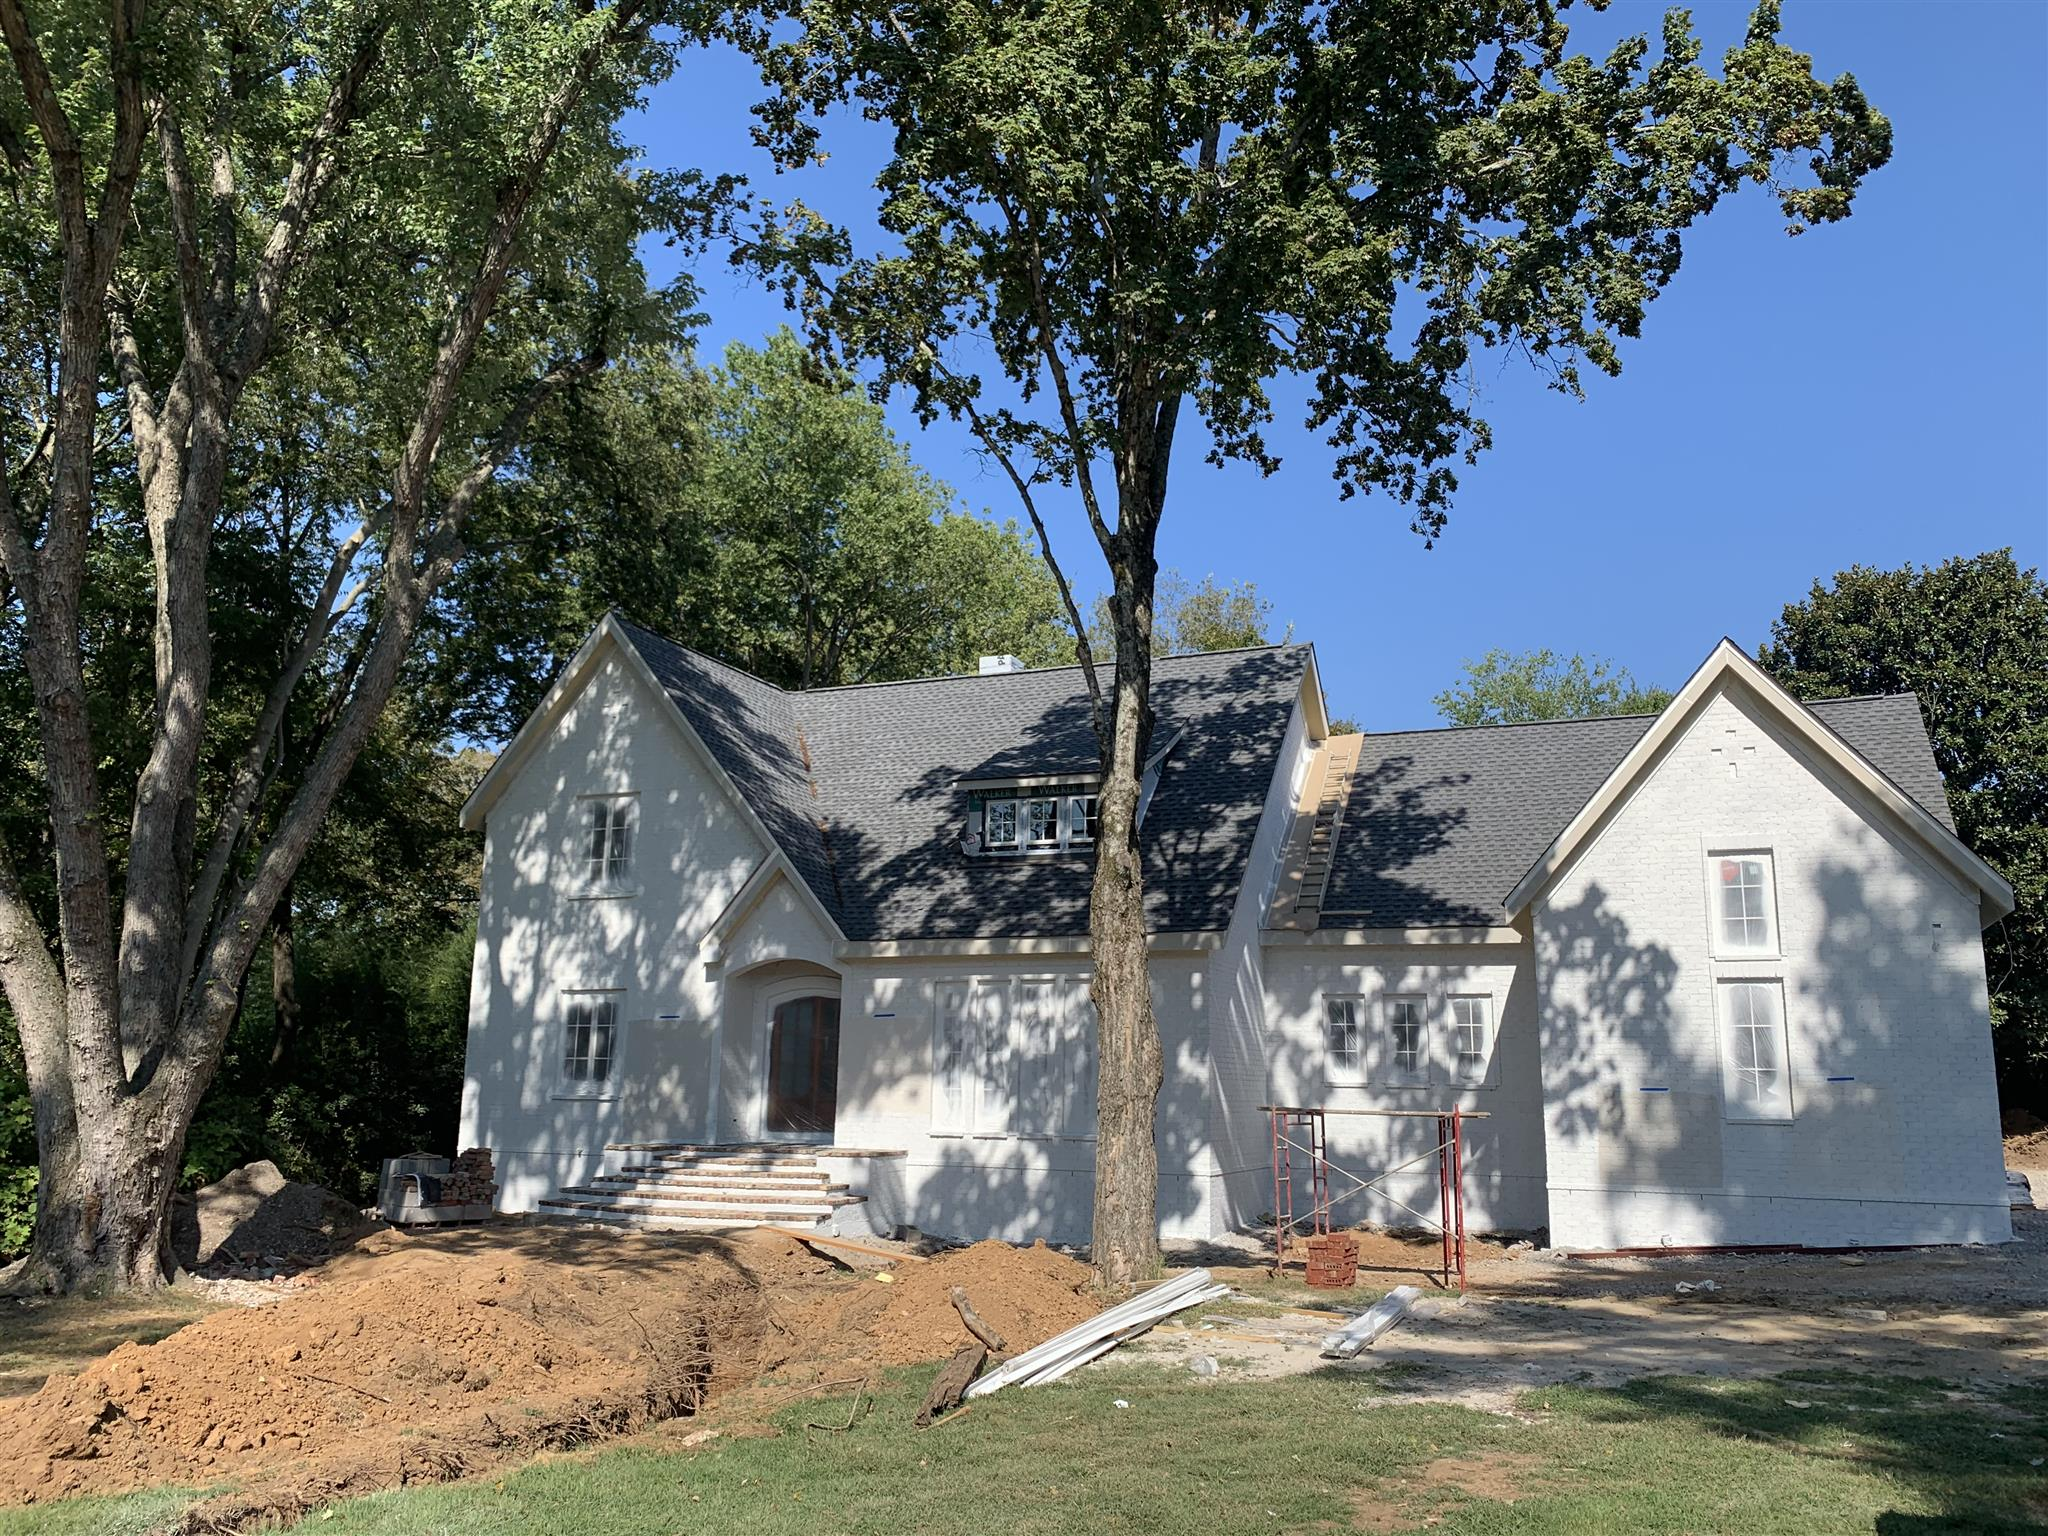 120 Heady Dr, Nashville, TN 37205 - Nashville, TN real estate listing